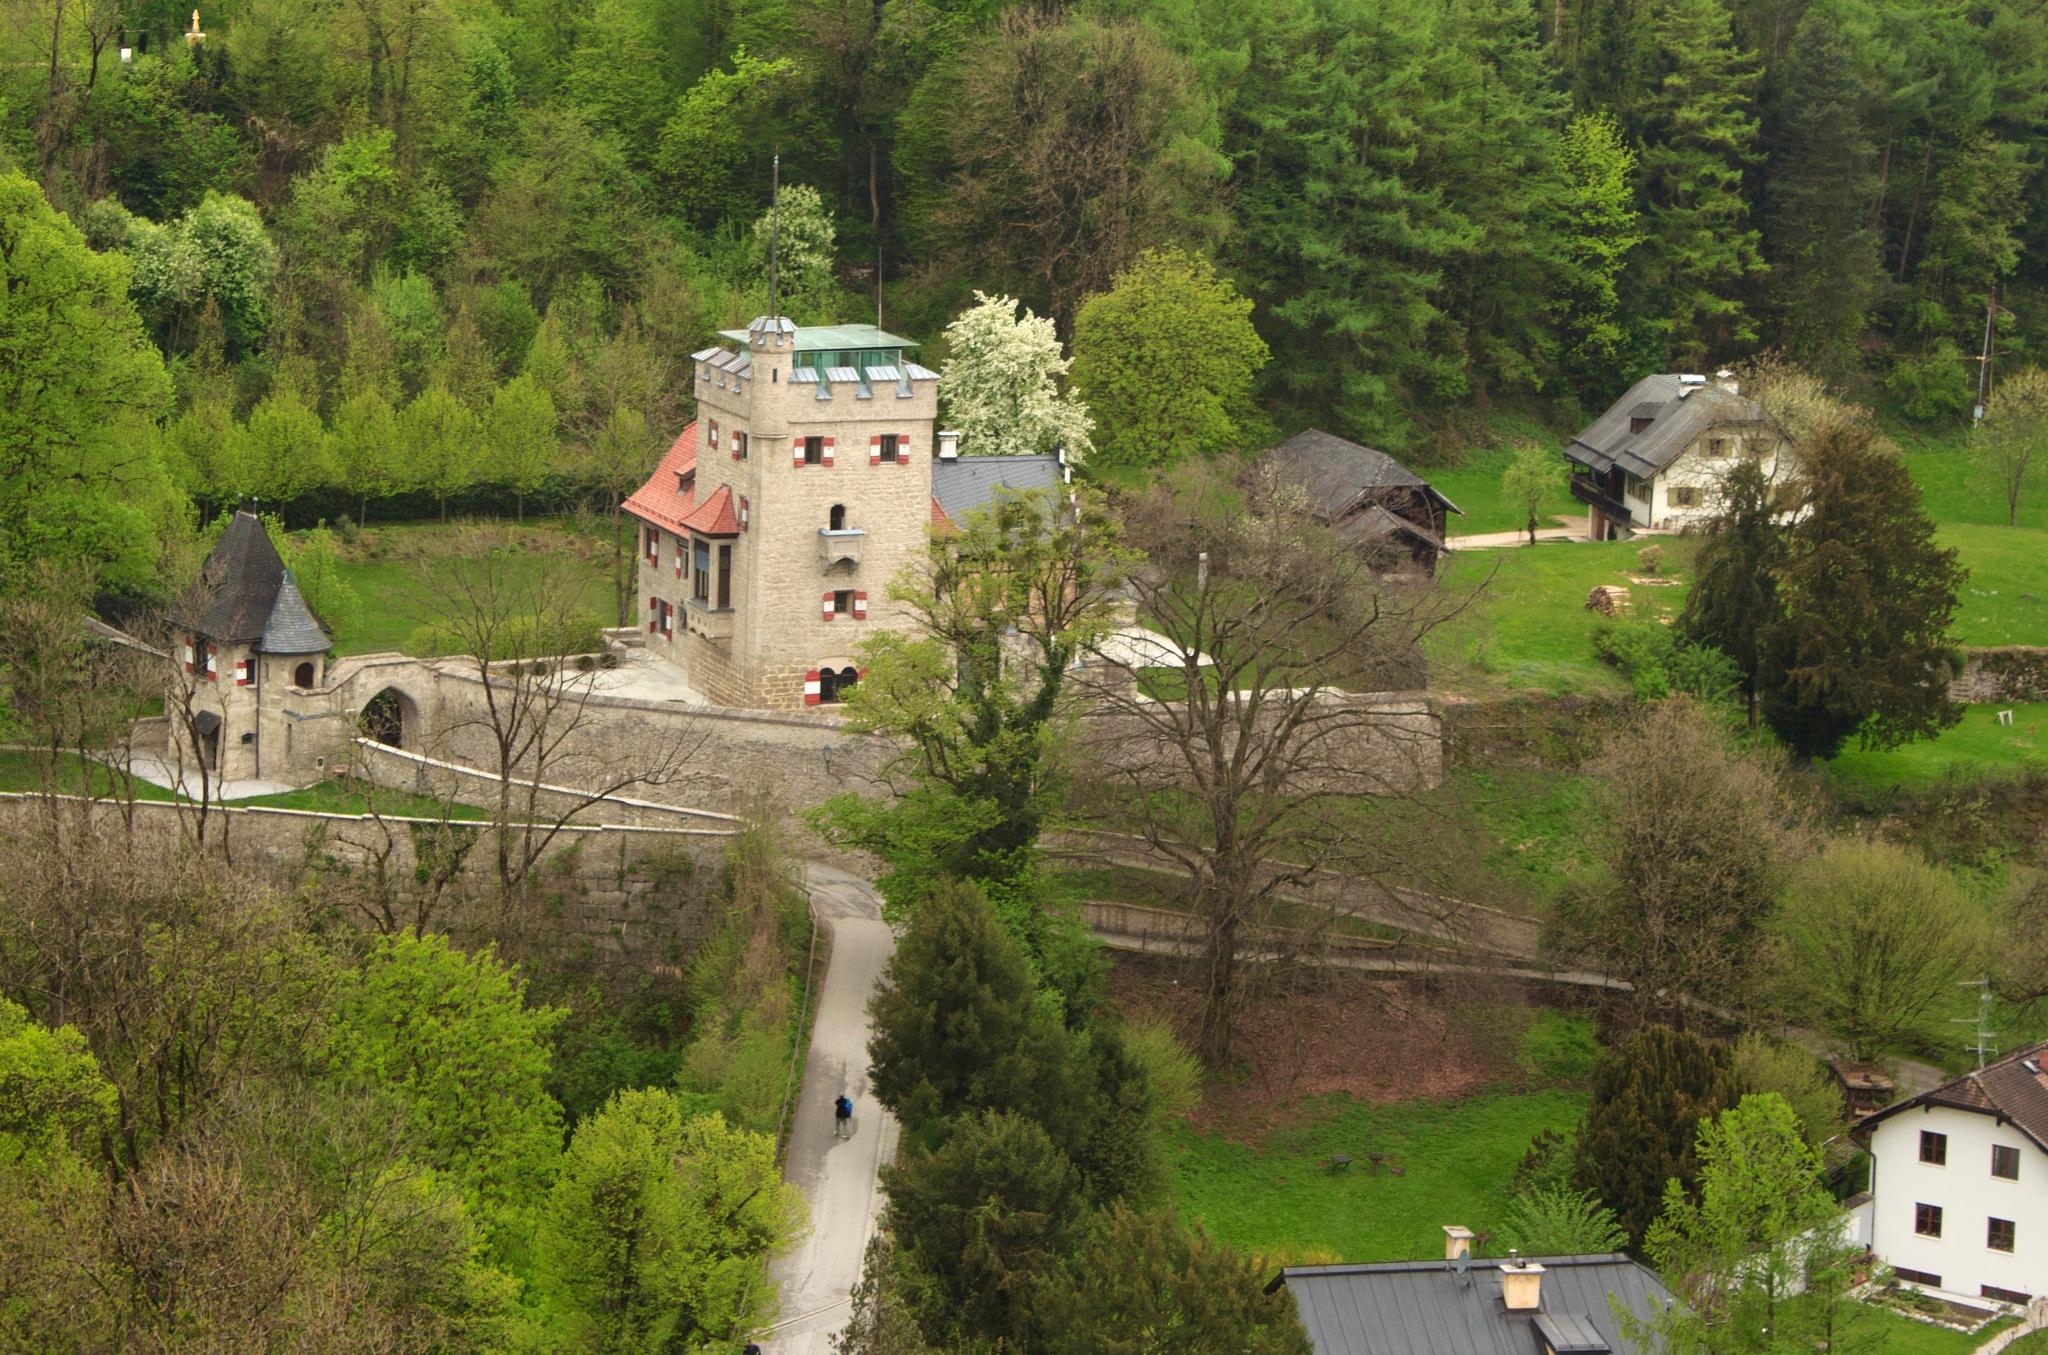 Austrian Countryside by dave.skorupski